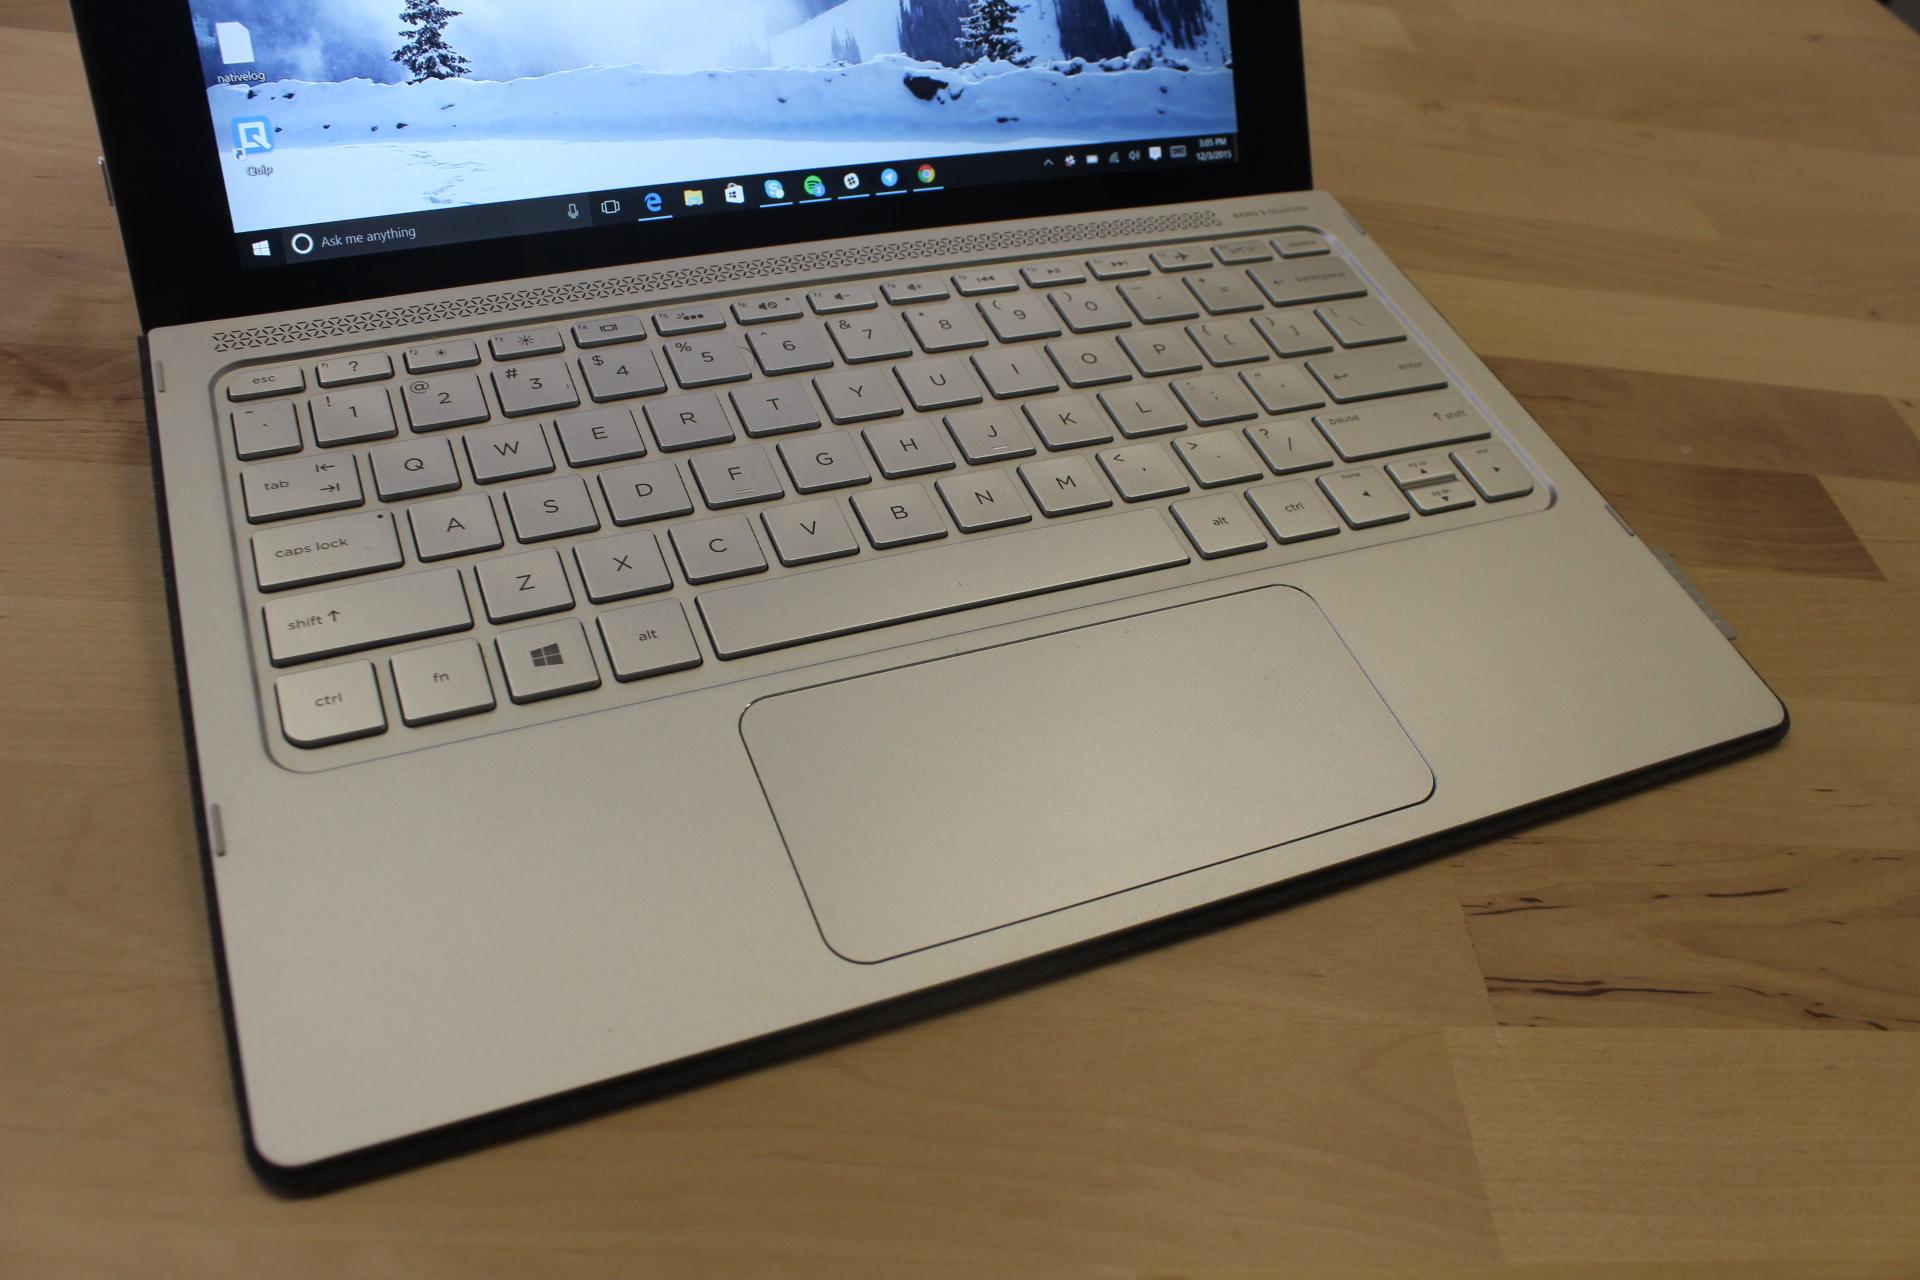 The HP Spectre x2's keyboard.